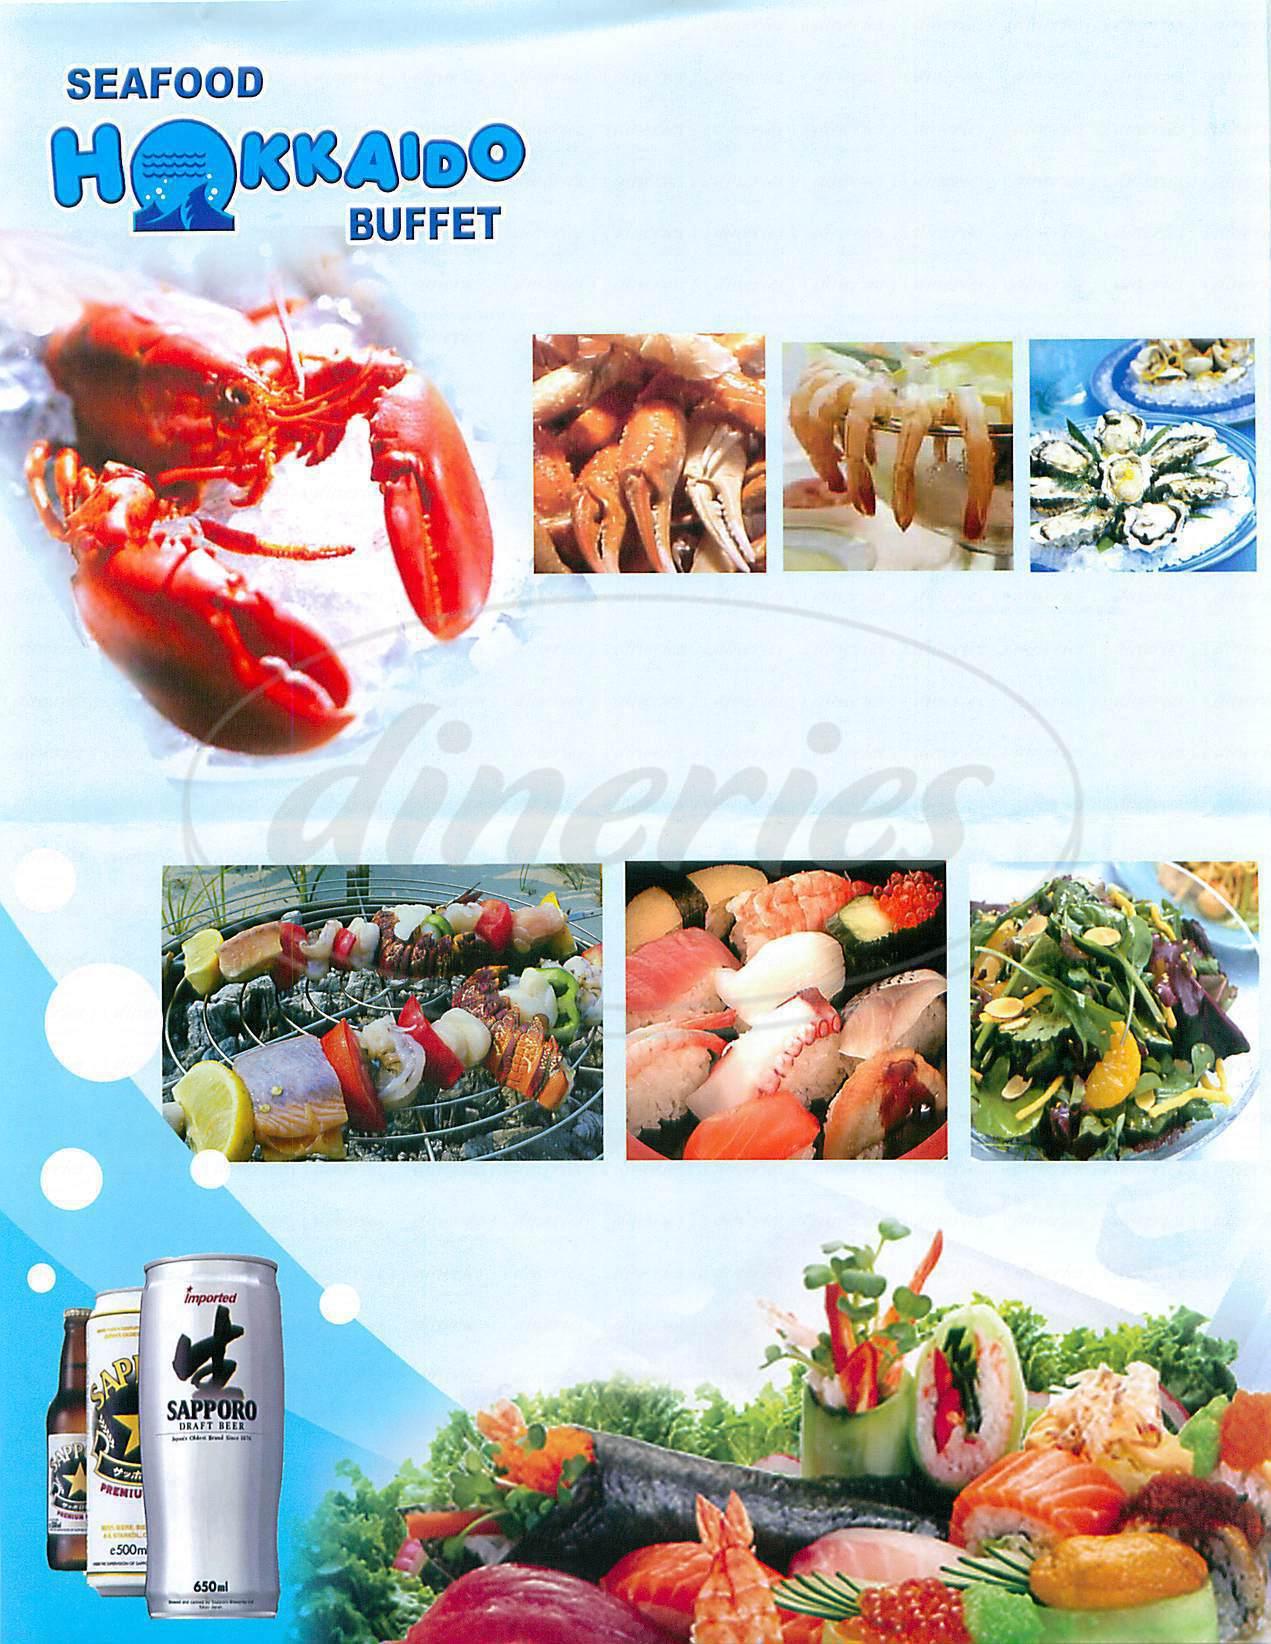 menu for Hokkaido Seafood Buffet